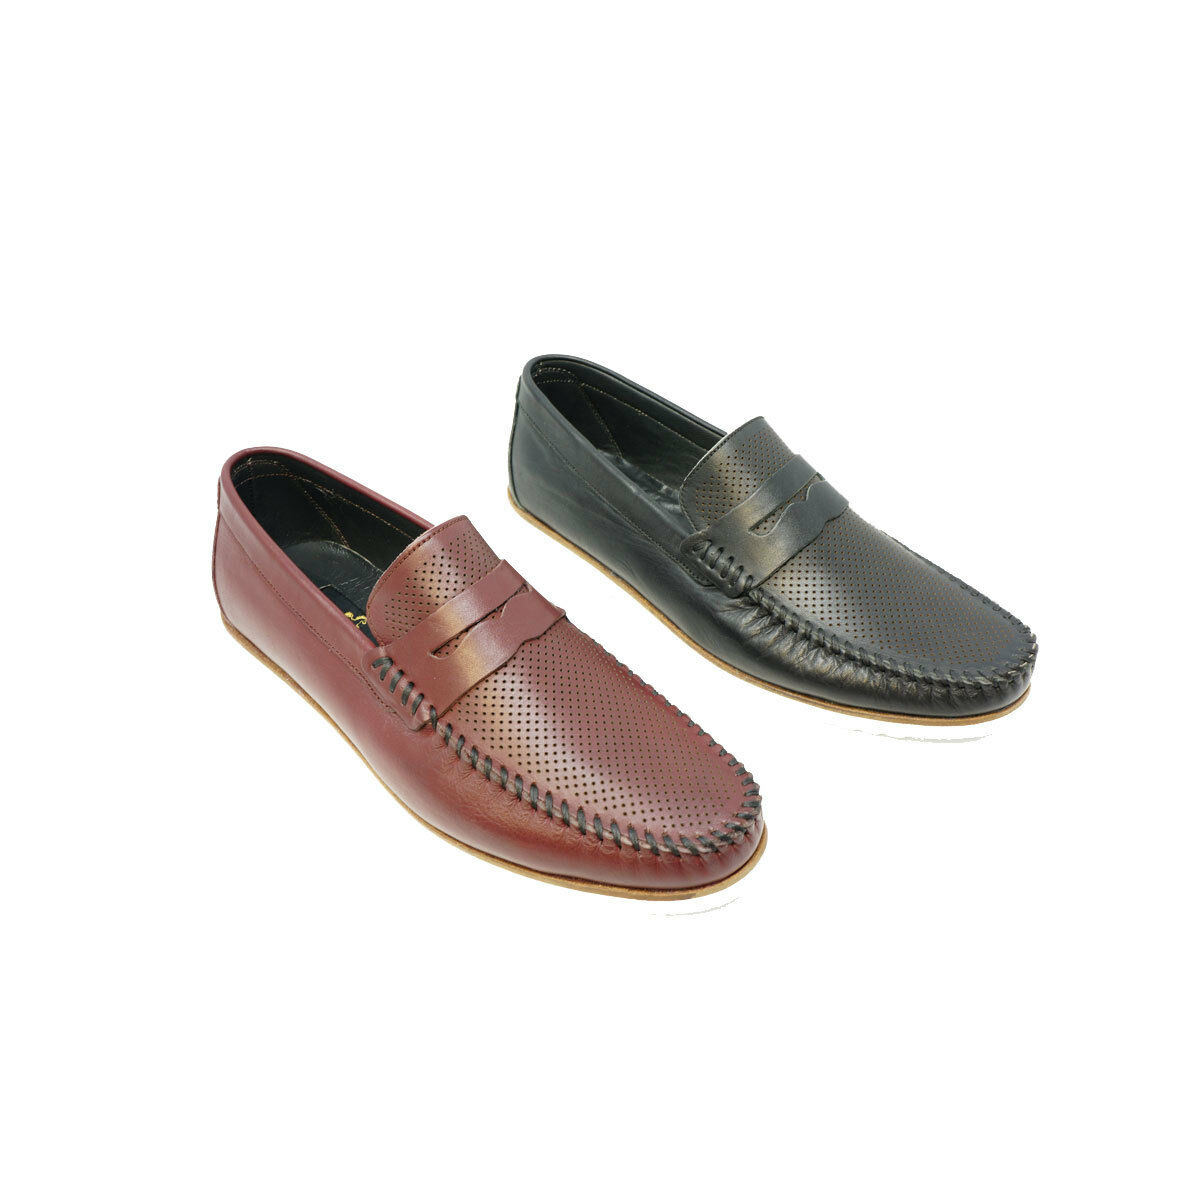 Futoli homme en cuir véritable Nouvelle Collection Mocassin Enfiler chaussures Handmade